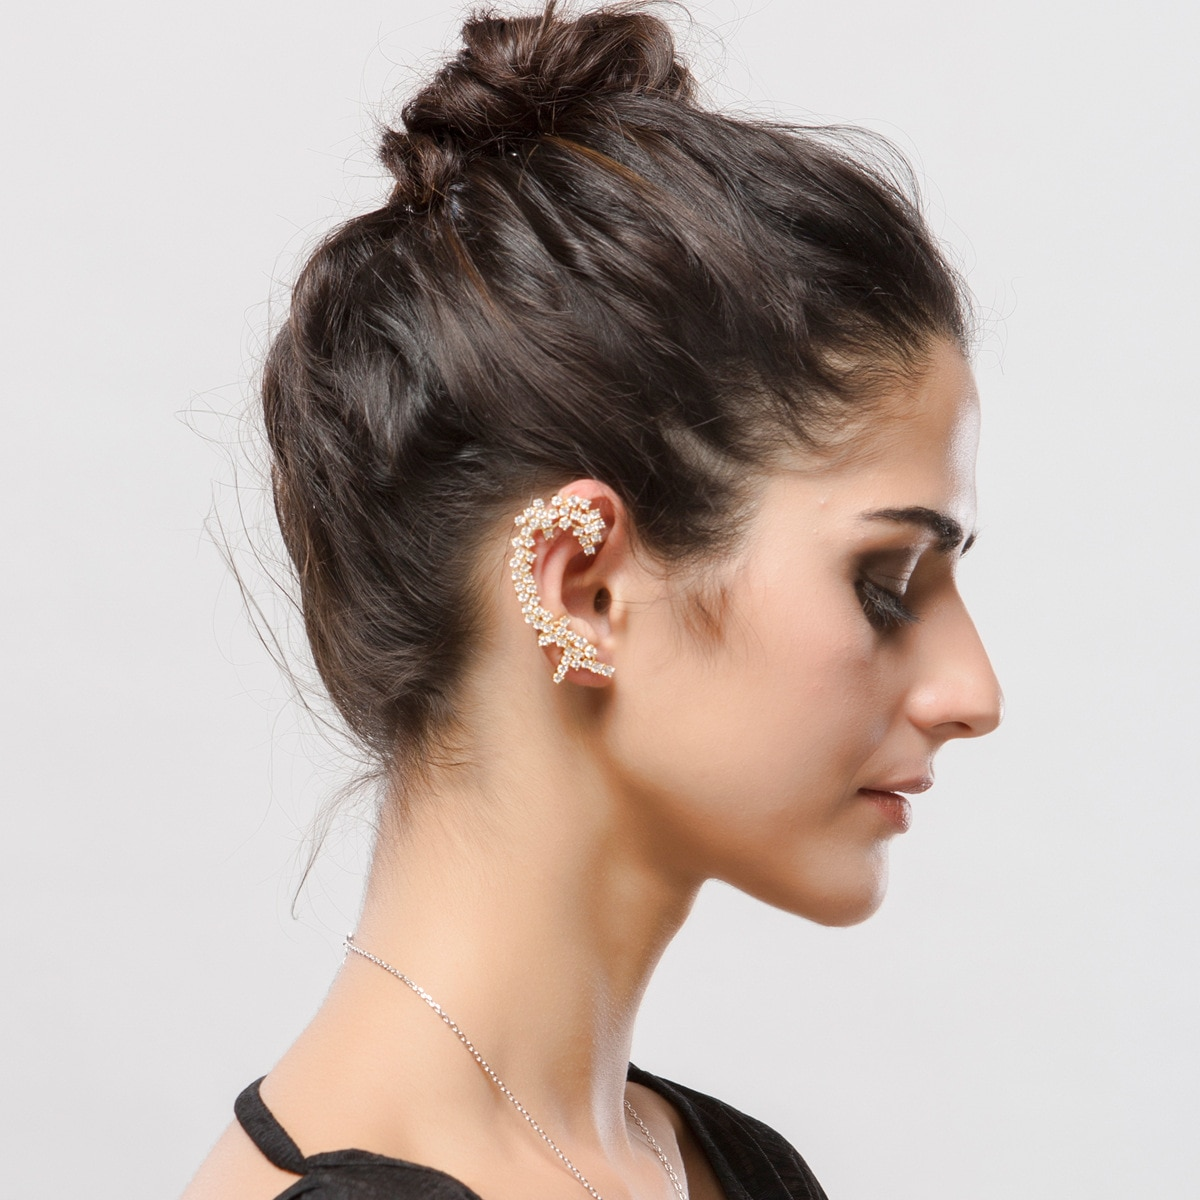 Tpm pino de aço anti-alergia ouro prata arma cor preta grampos de orelha para senhoras moda luxo aaa cúbico zircônia orelha punhos jóias